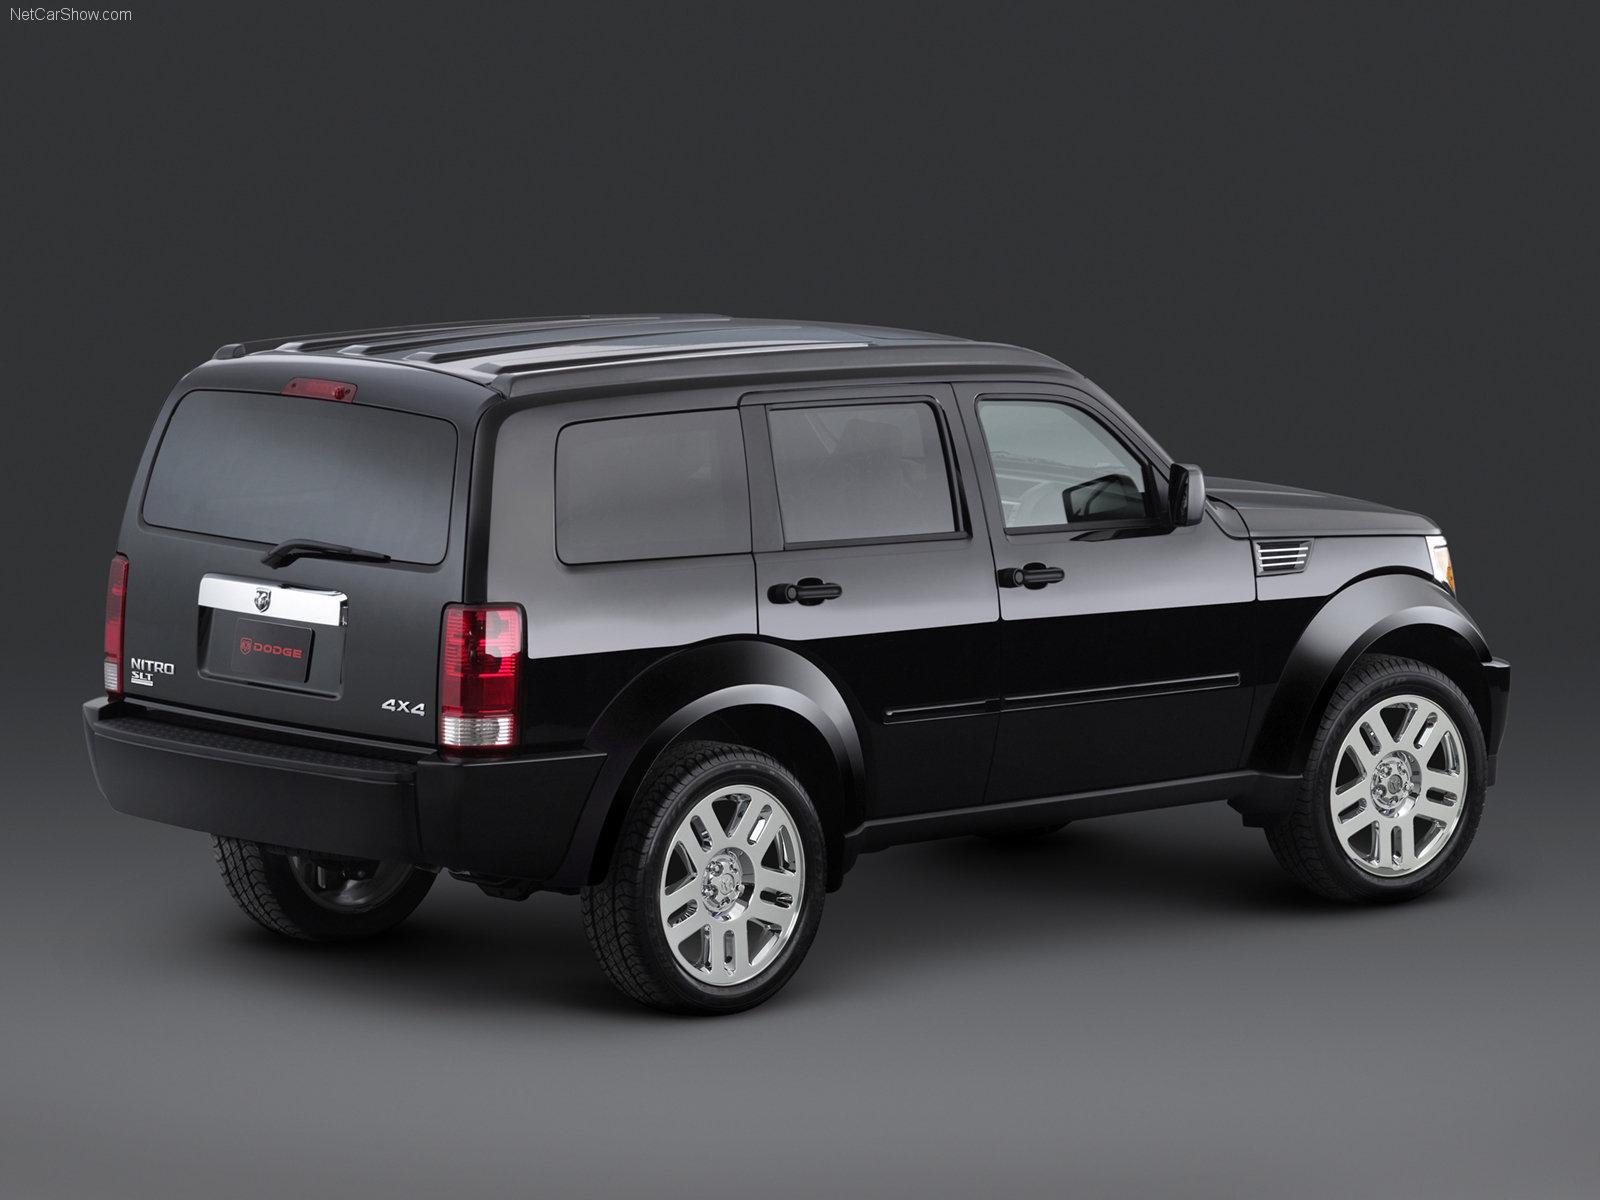 2015 Dodge Neon >> 3DTuning of Dodge Nitro SUV 2006 3DTuning.com - unique on ...